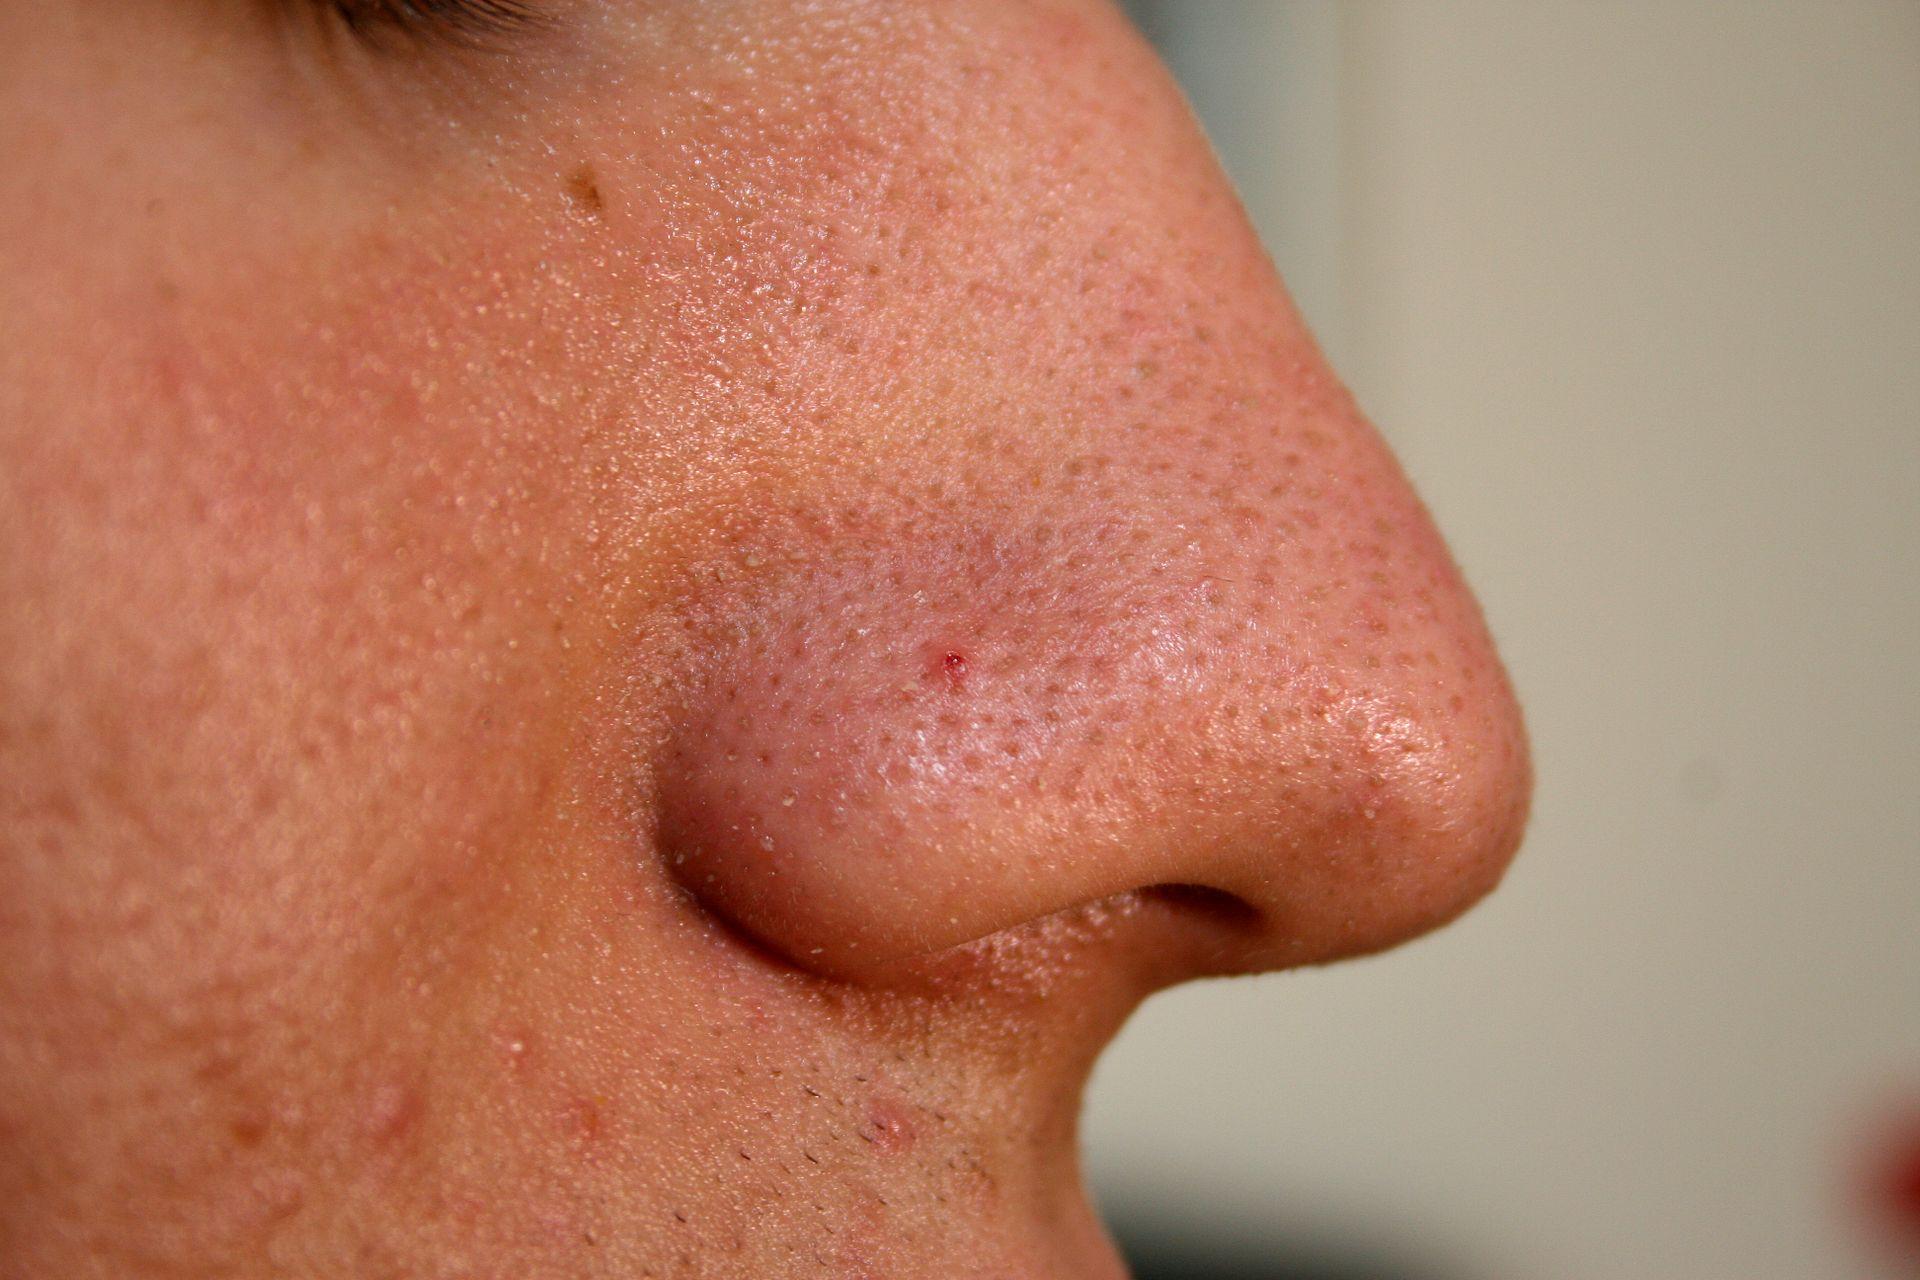 Nose with blackhead